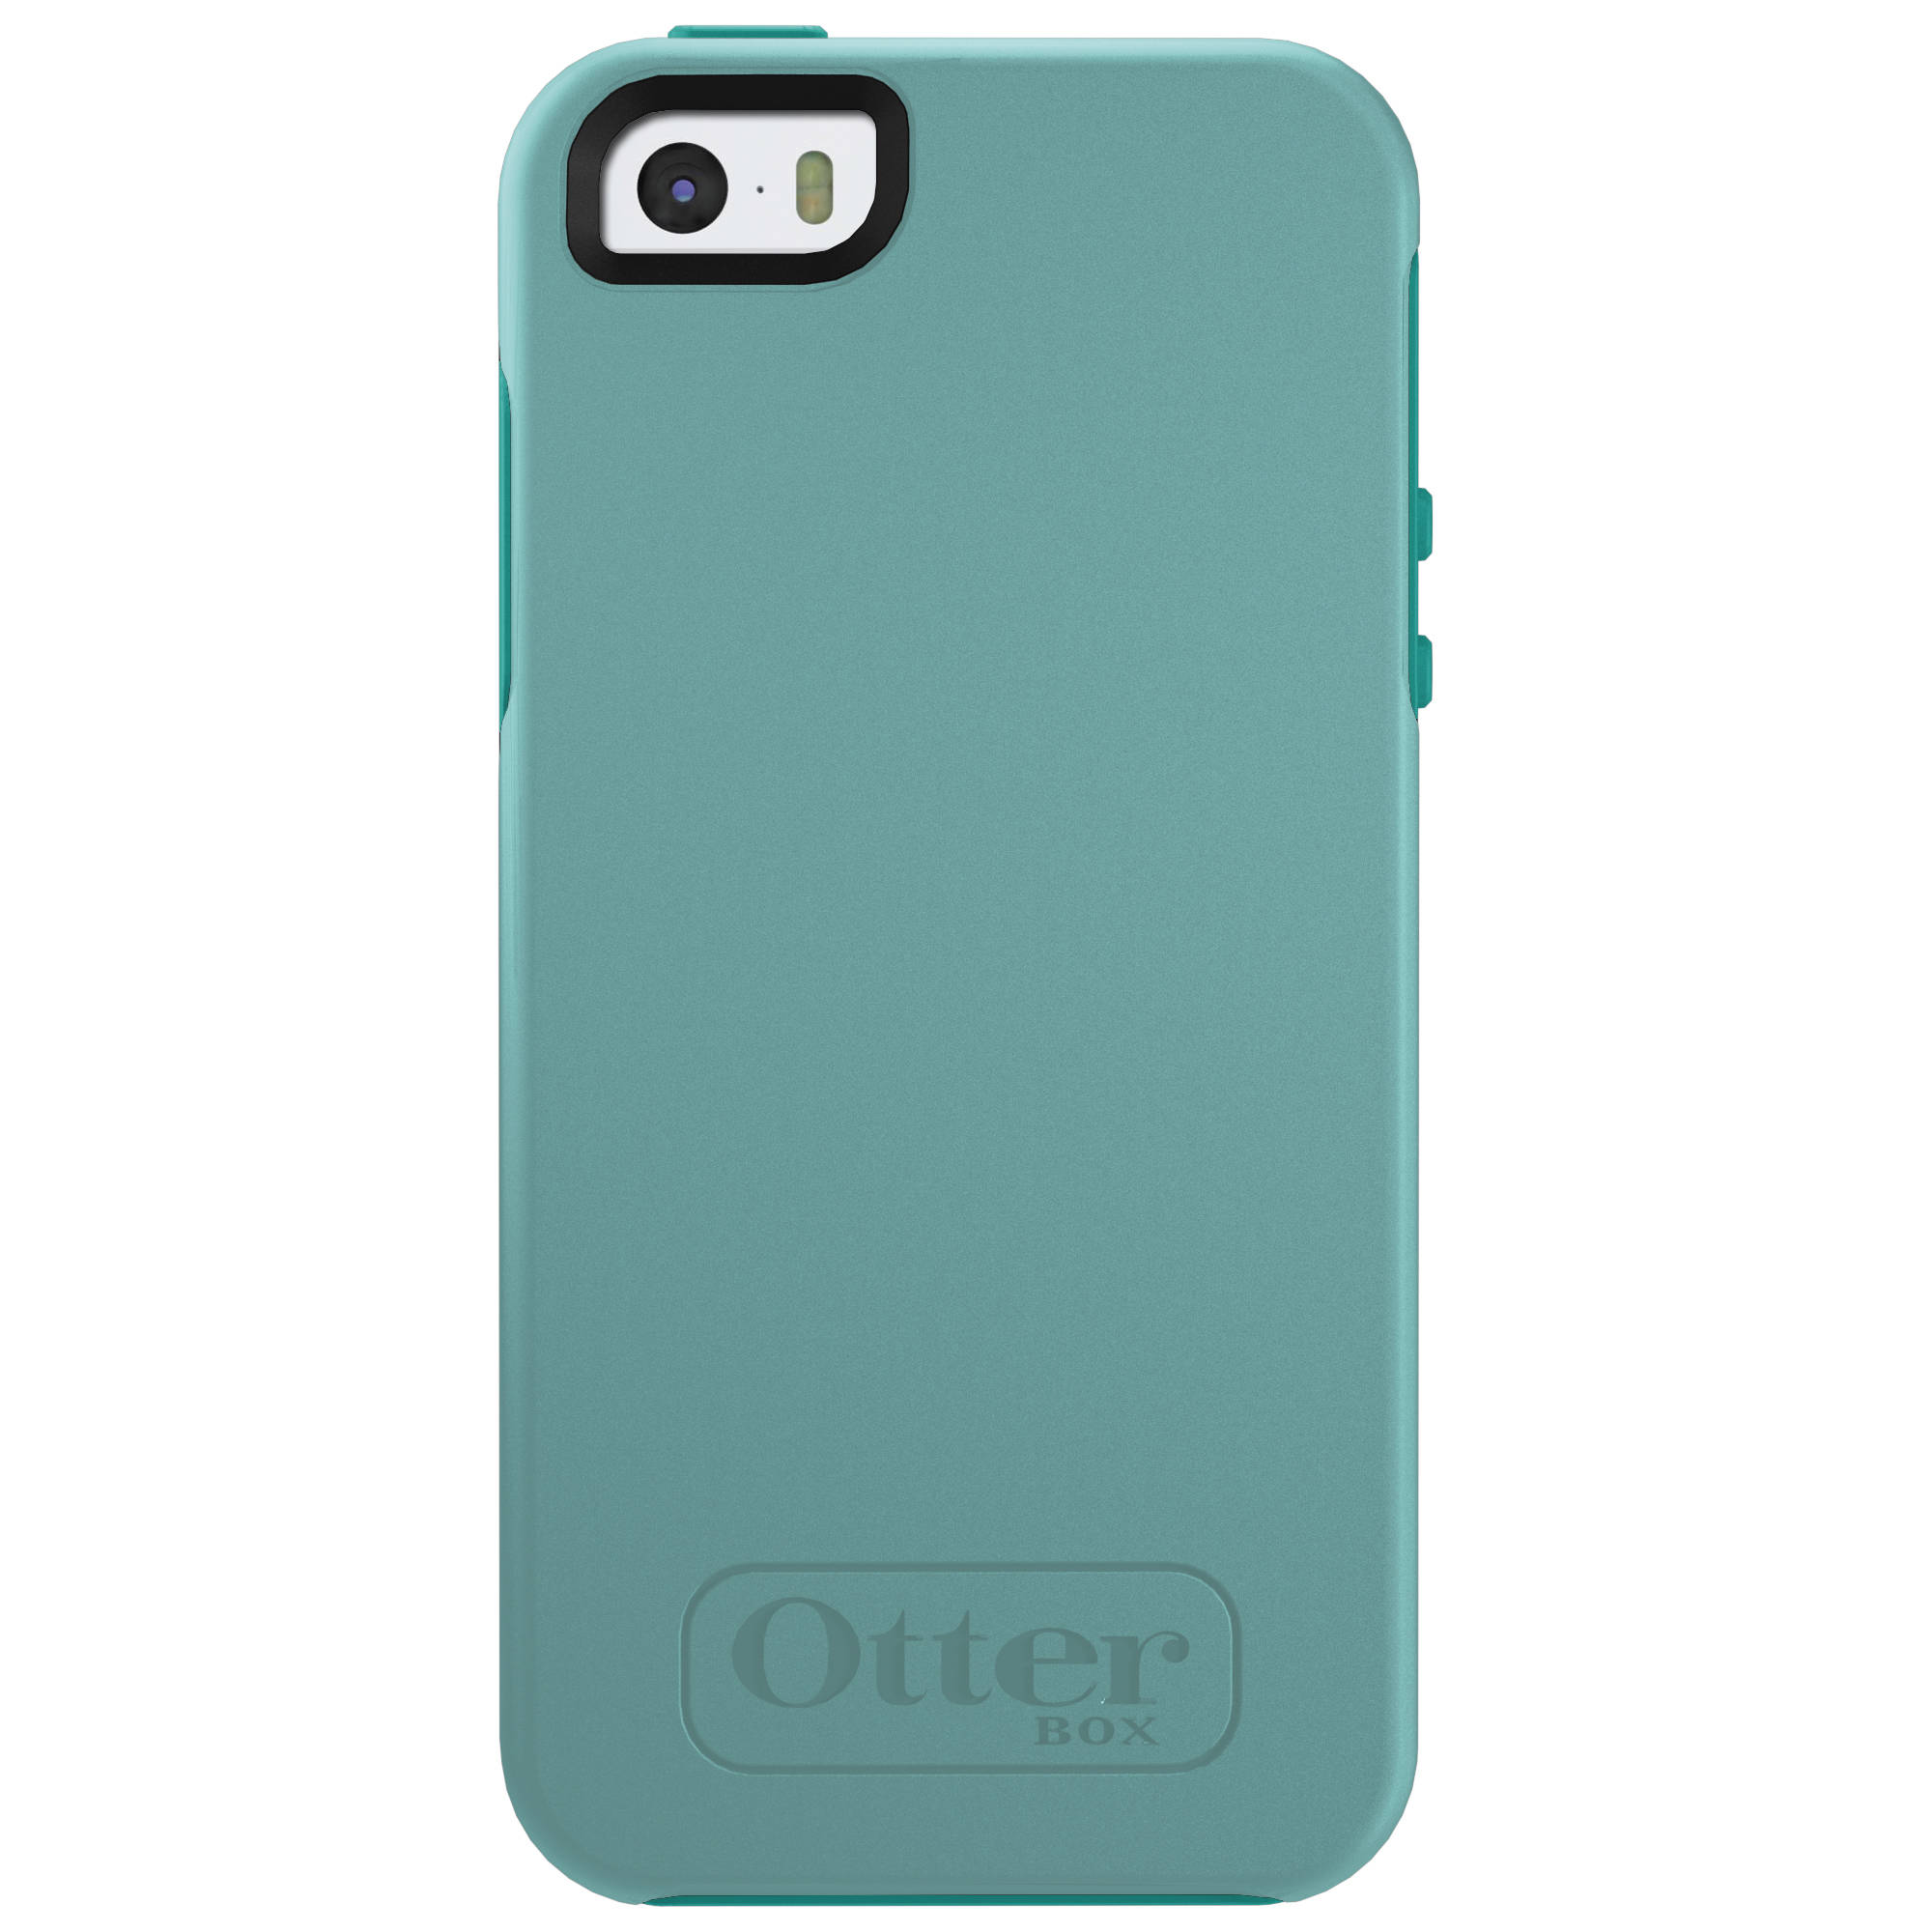 reputable site 0116f bf4cb OtterBox Symmetry Series Case for iPhone 5/5s/SE (Aqua Sky)